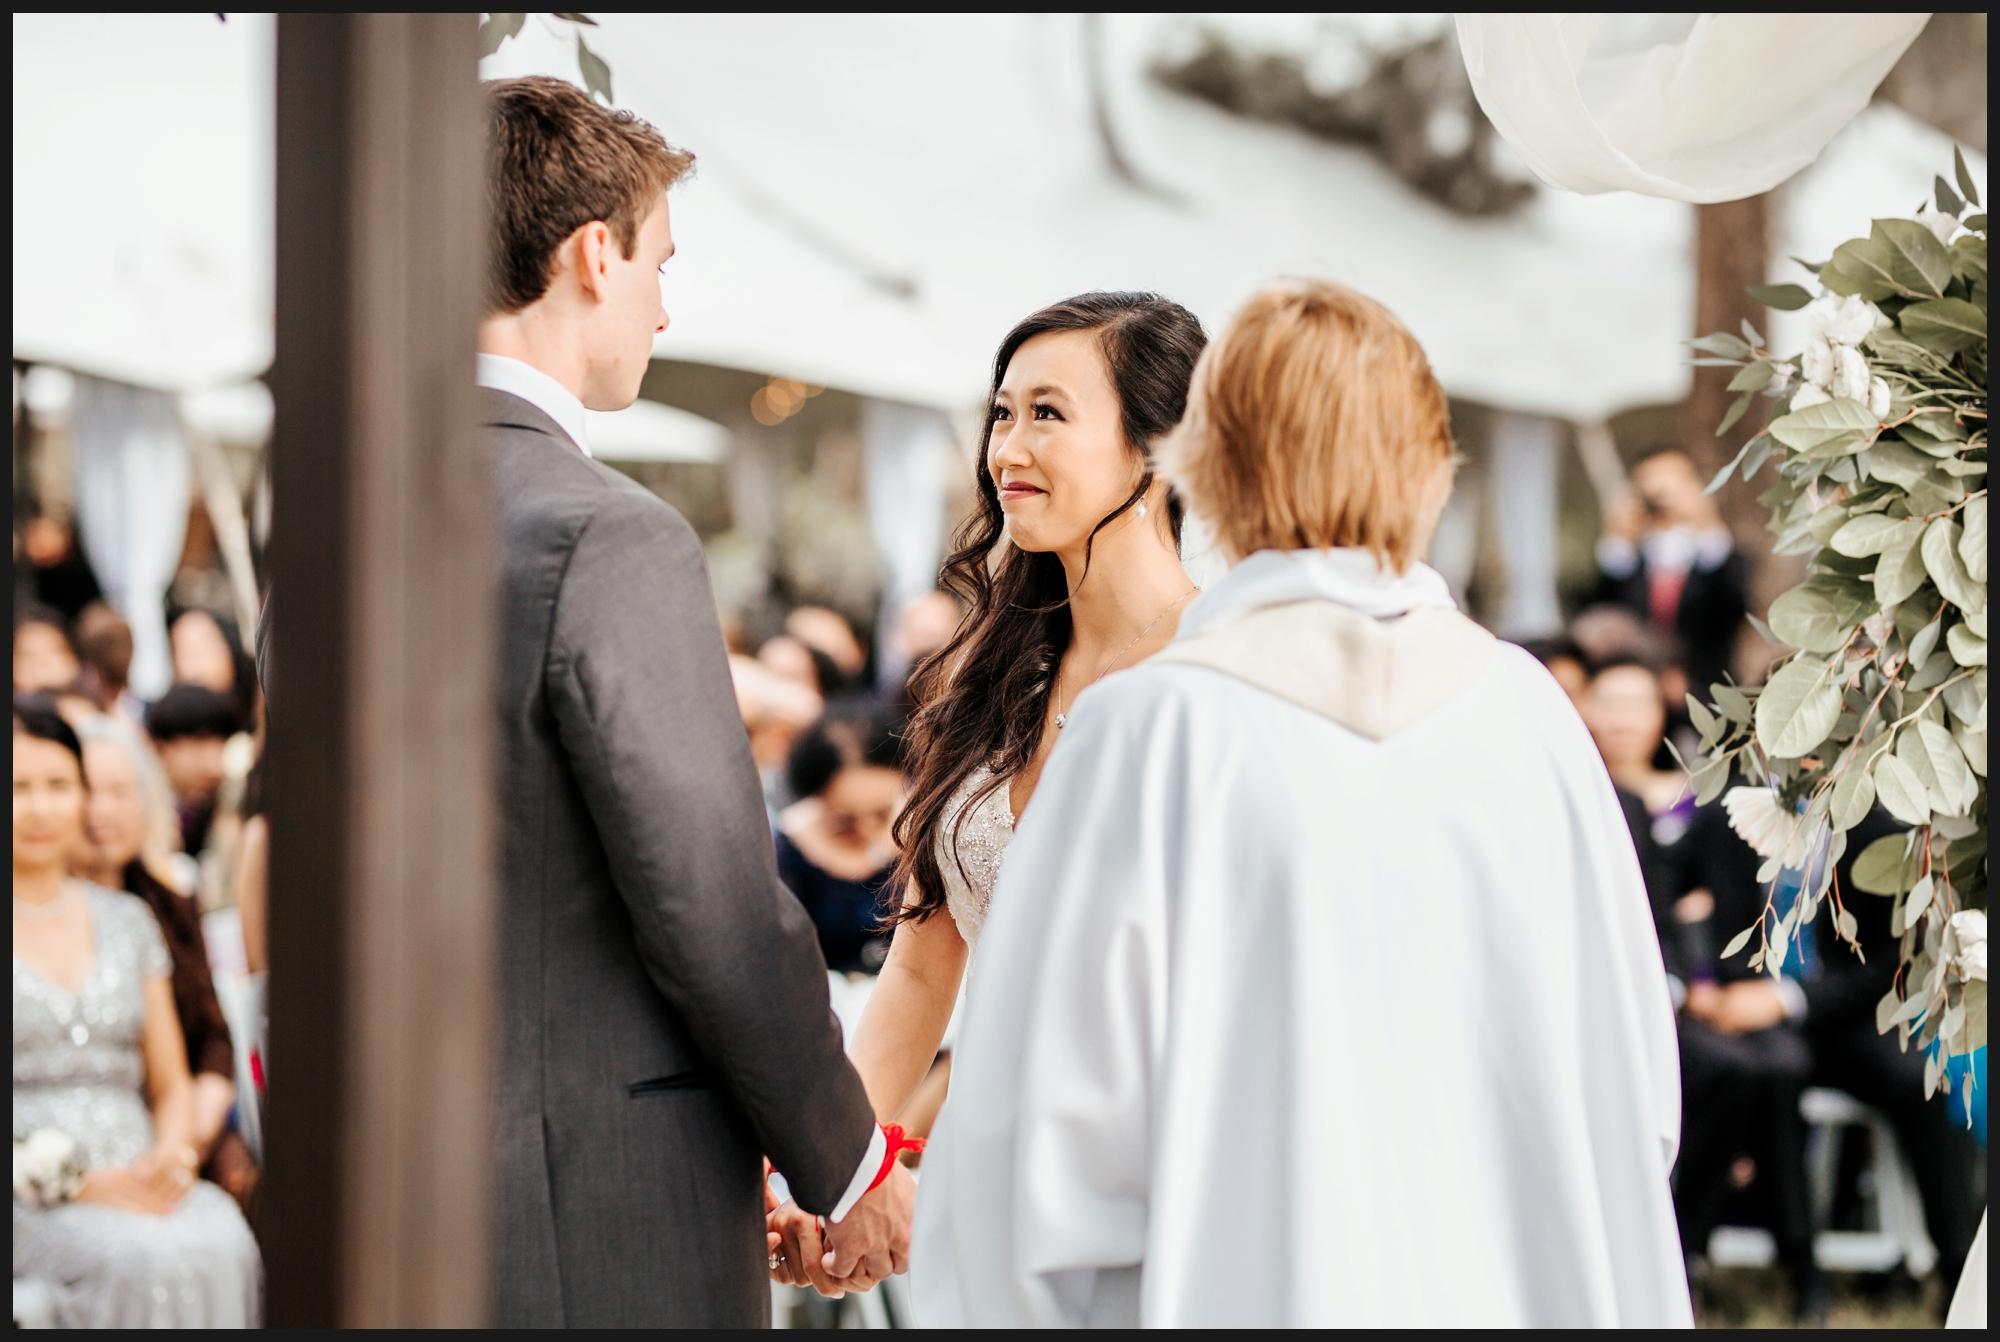 Orlando-Wedding-Photographer-destination-wedding-photographer-florida-wedding-photographer-bohemian-wedding-photographer_1427.jpg